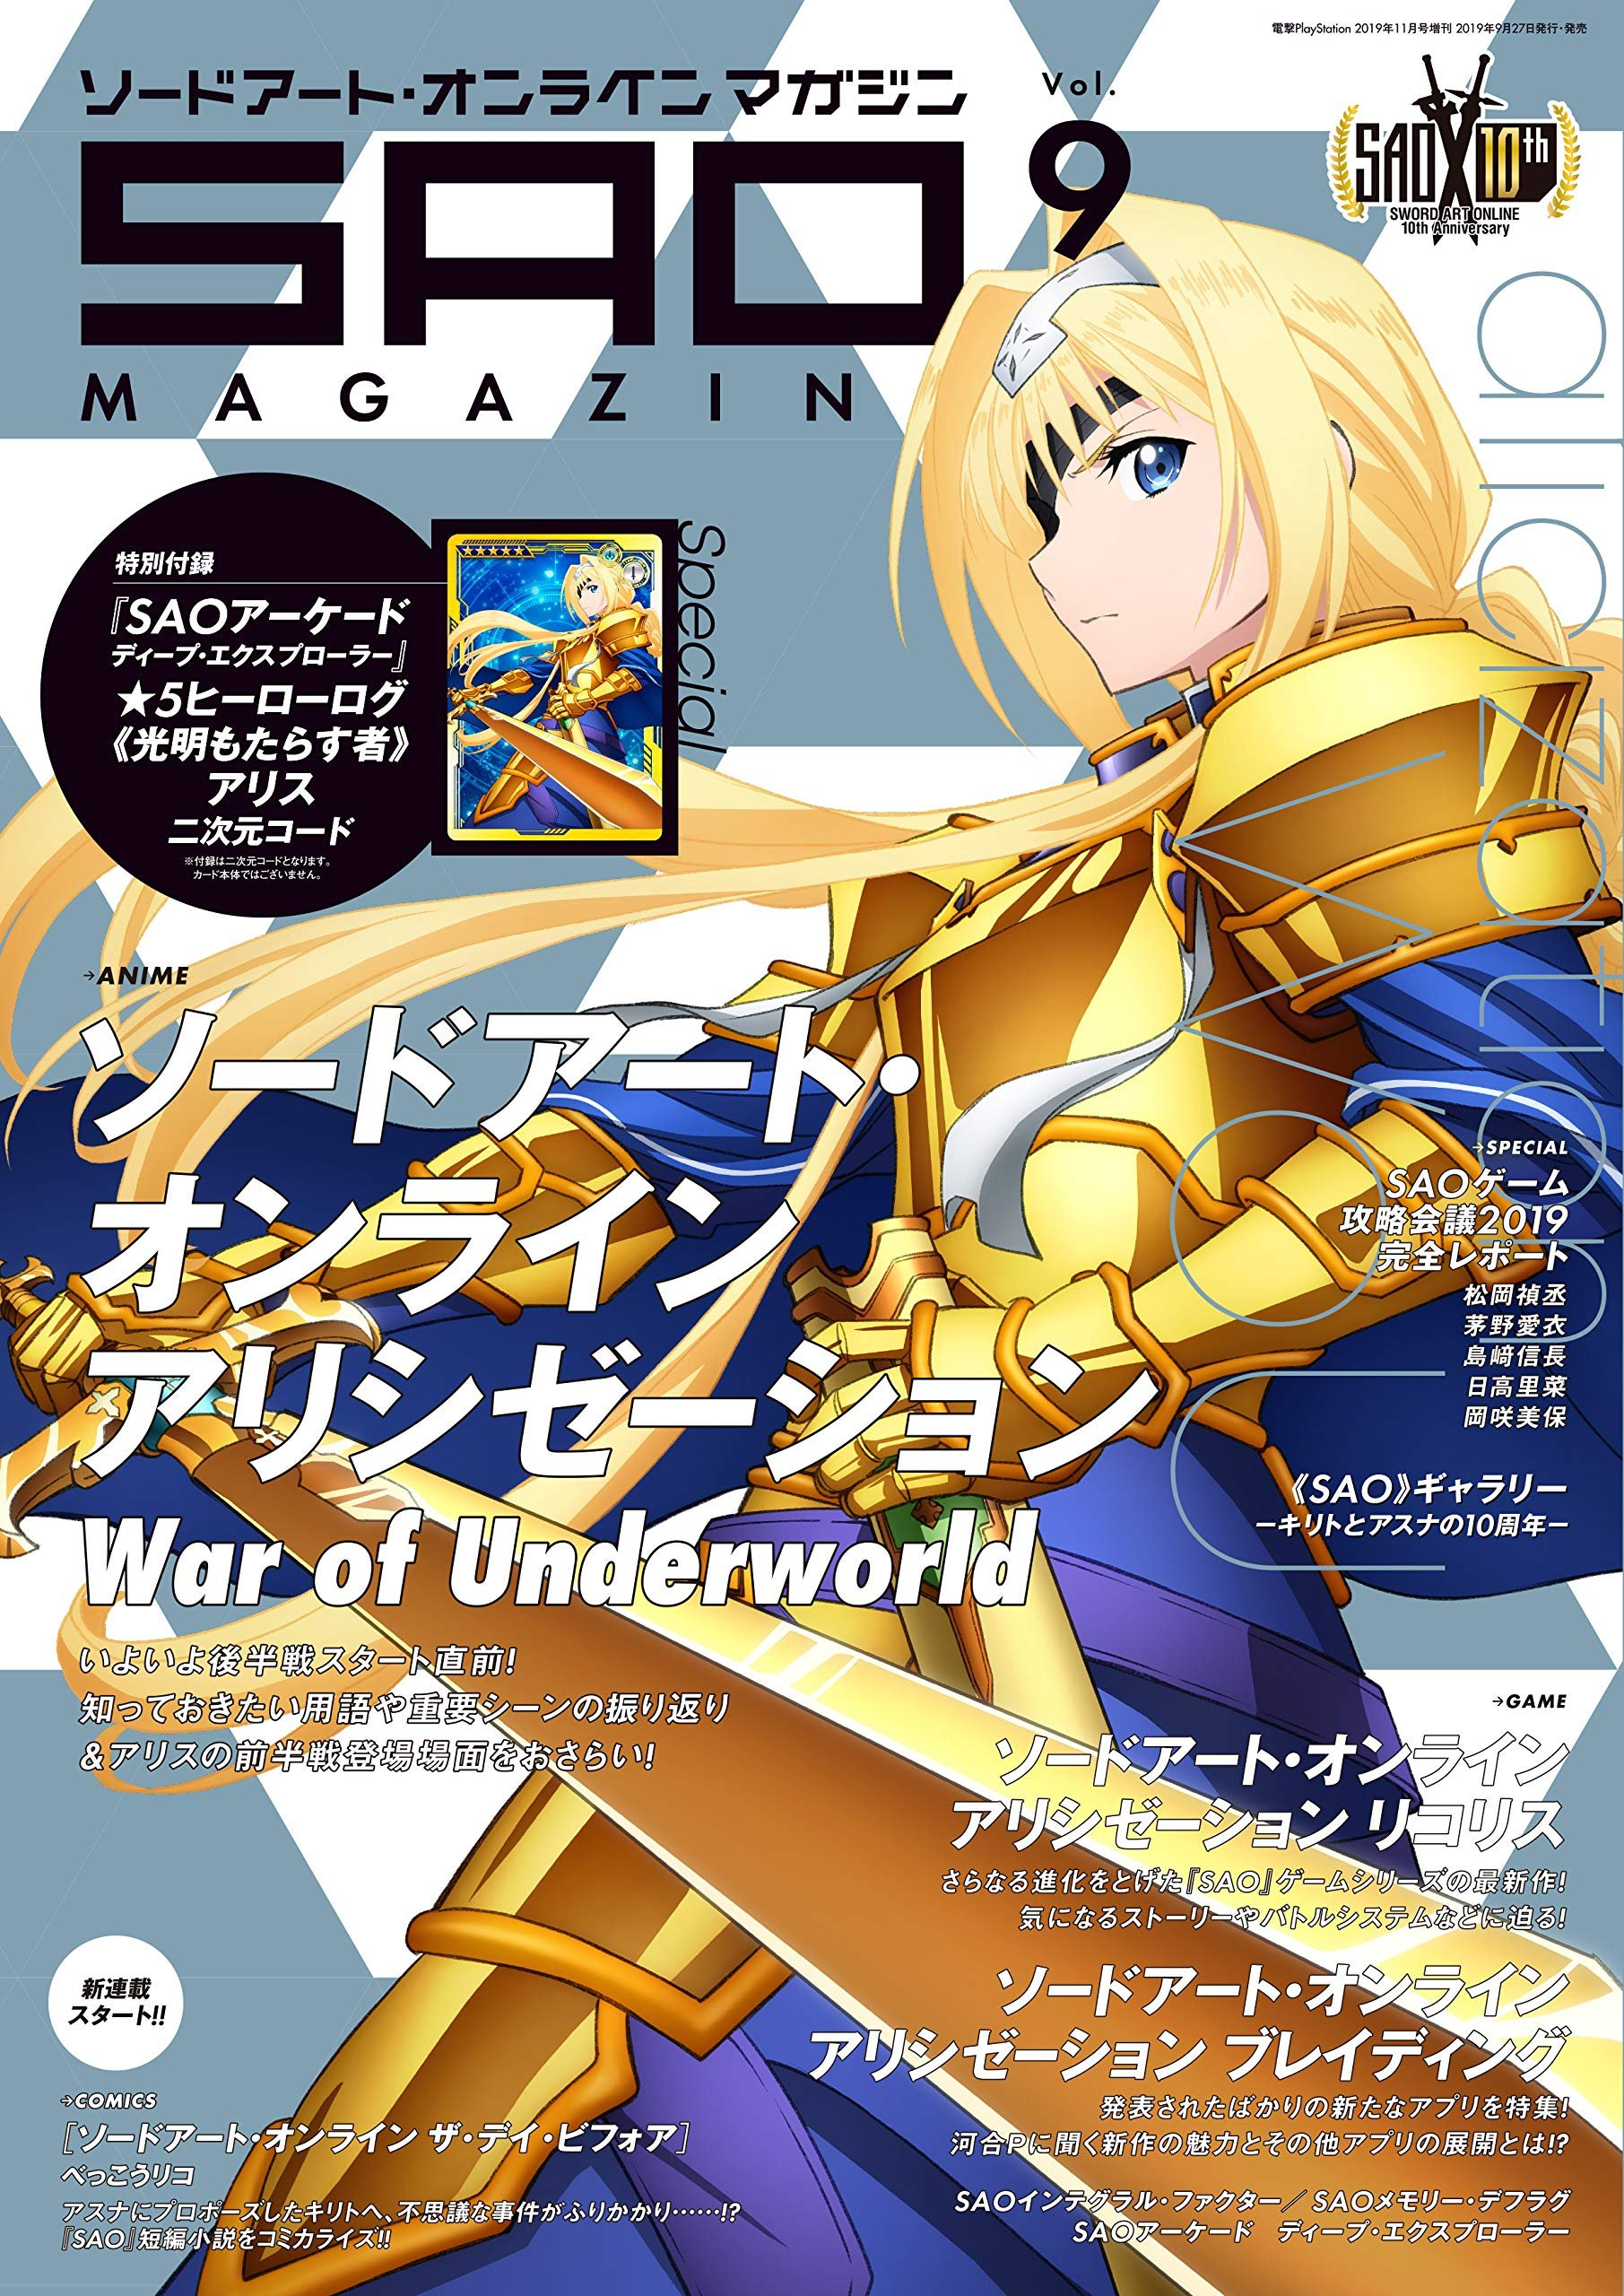 Sword Art Online Magazine Vol.09 (November 2019)